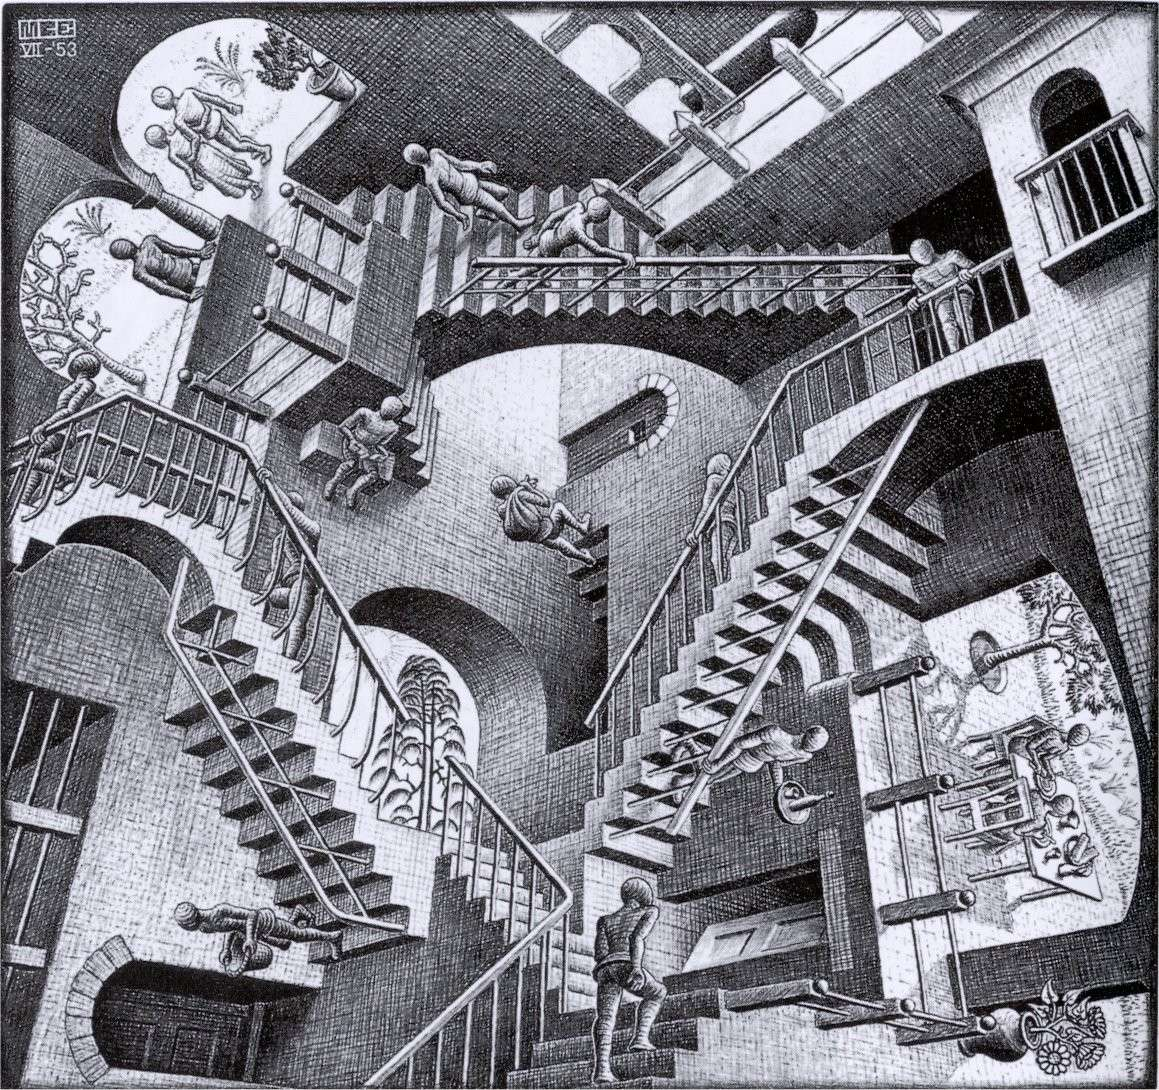 Relatività, 1953